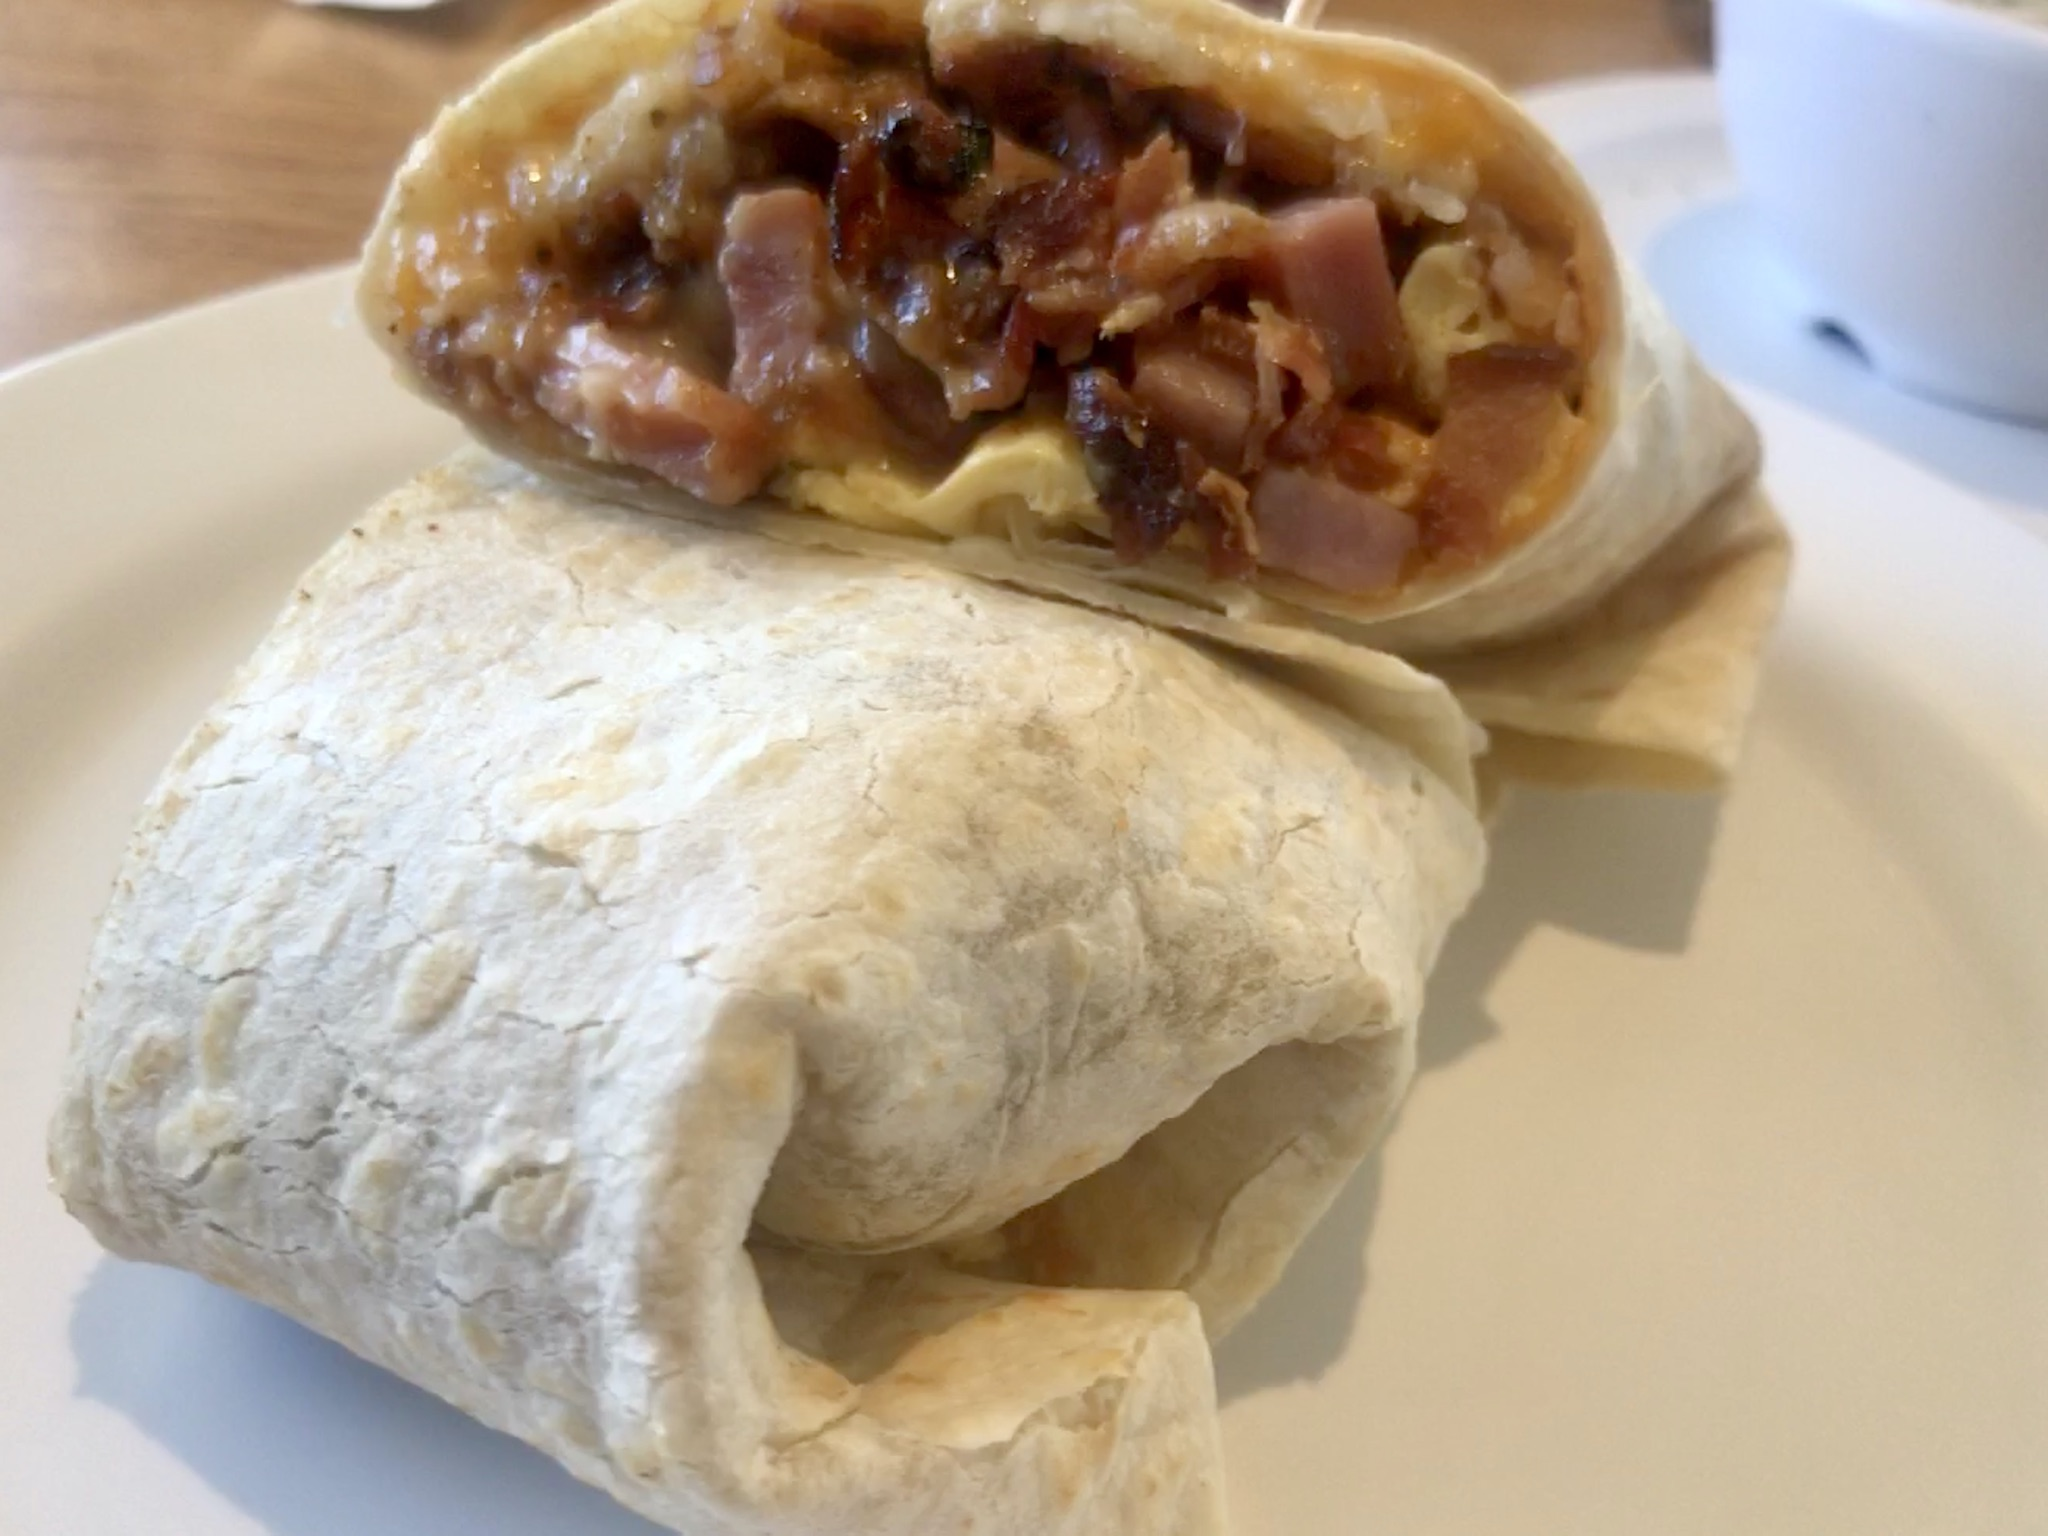 Breakfast Burritos at Just Joels in Kennewick – October 22 2020